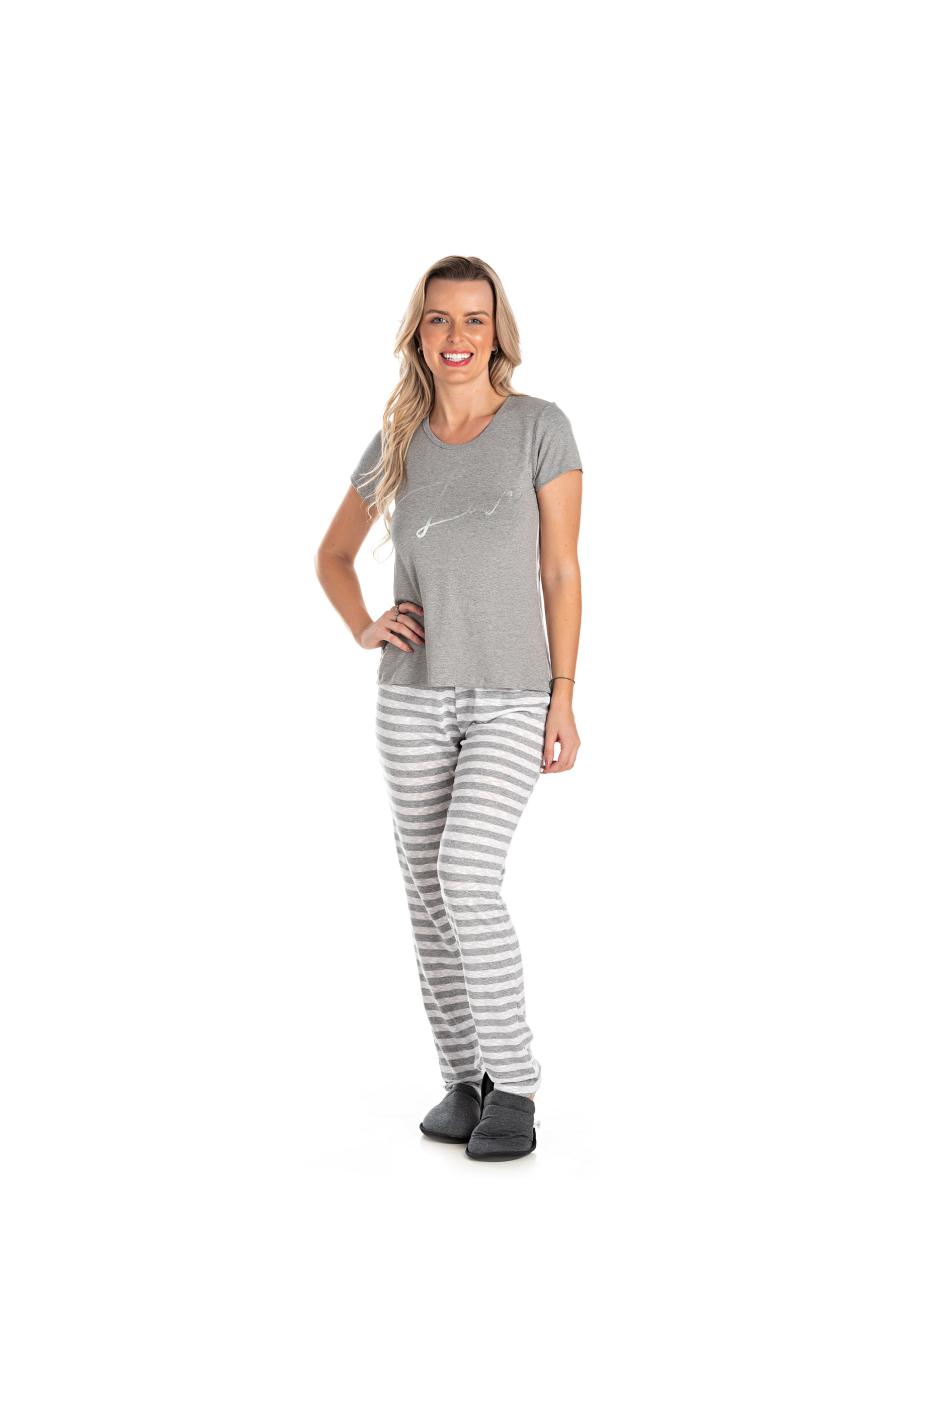 009/A - Pijama Adulto Feminino Curto Com Fio Flamê